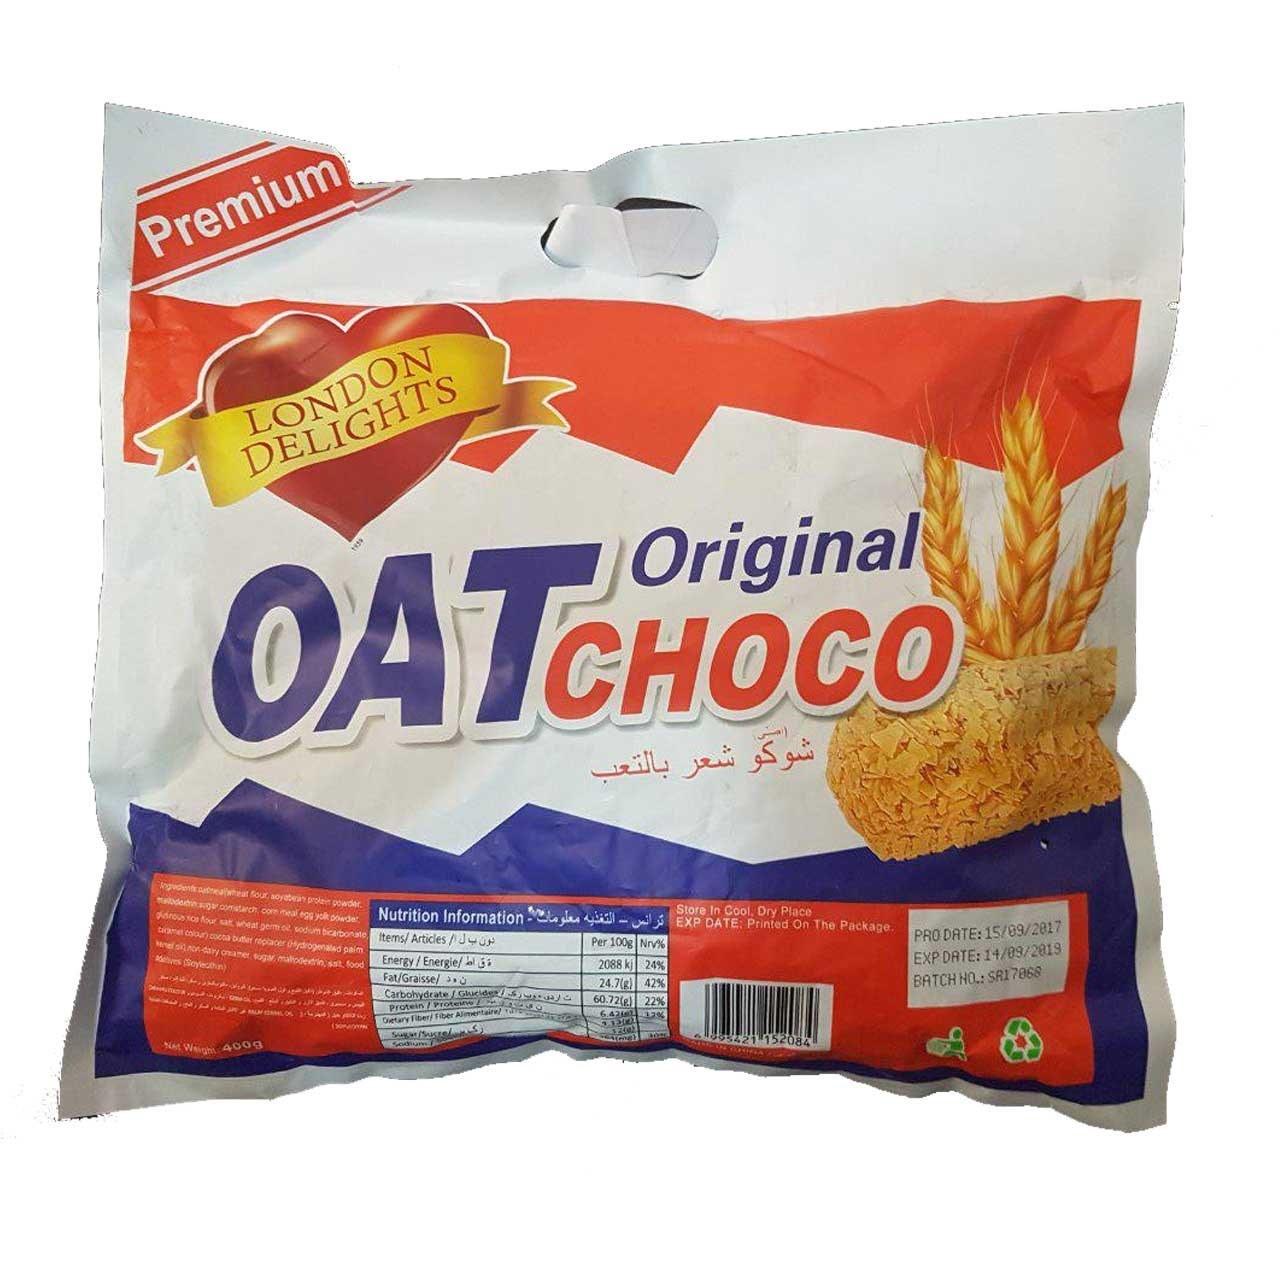 ساشه غلات Oat Choco مدل Original | Oat Choco Chocolate Single Serving